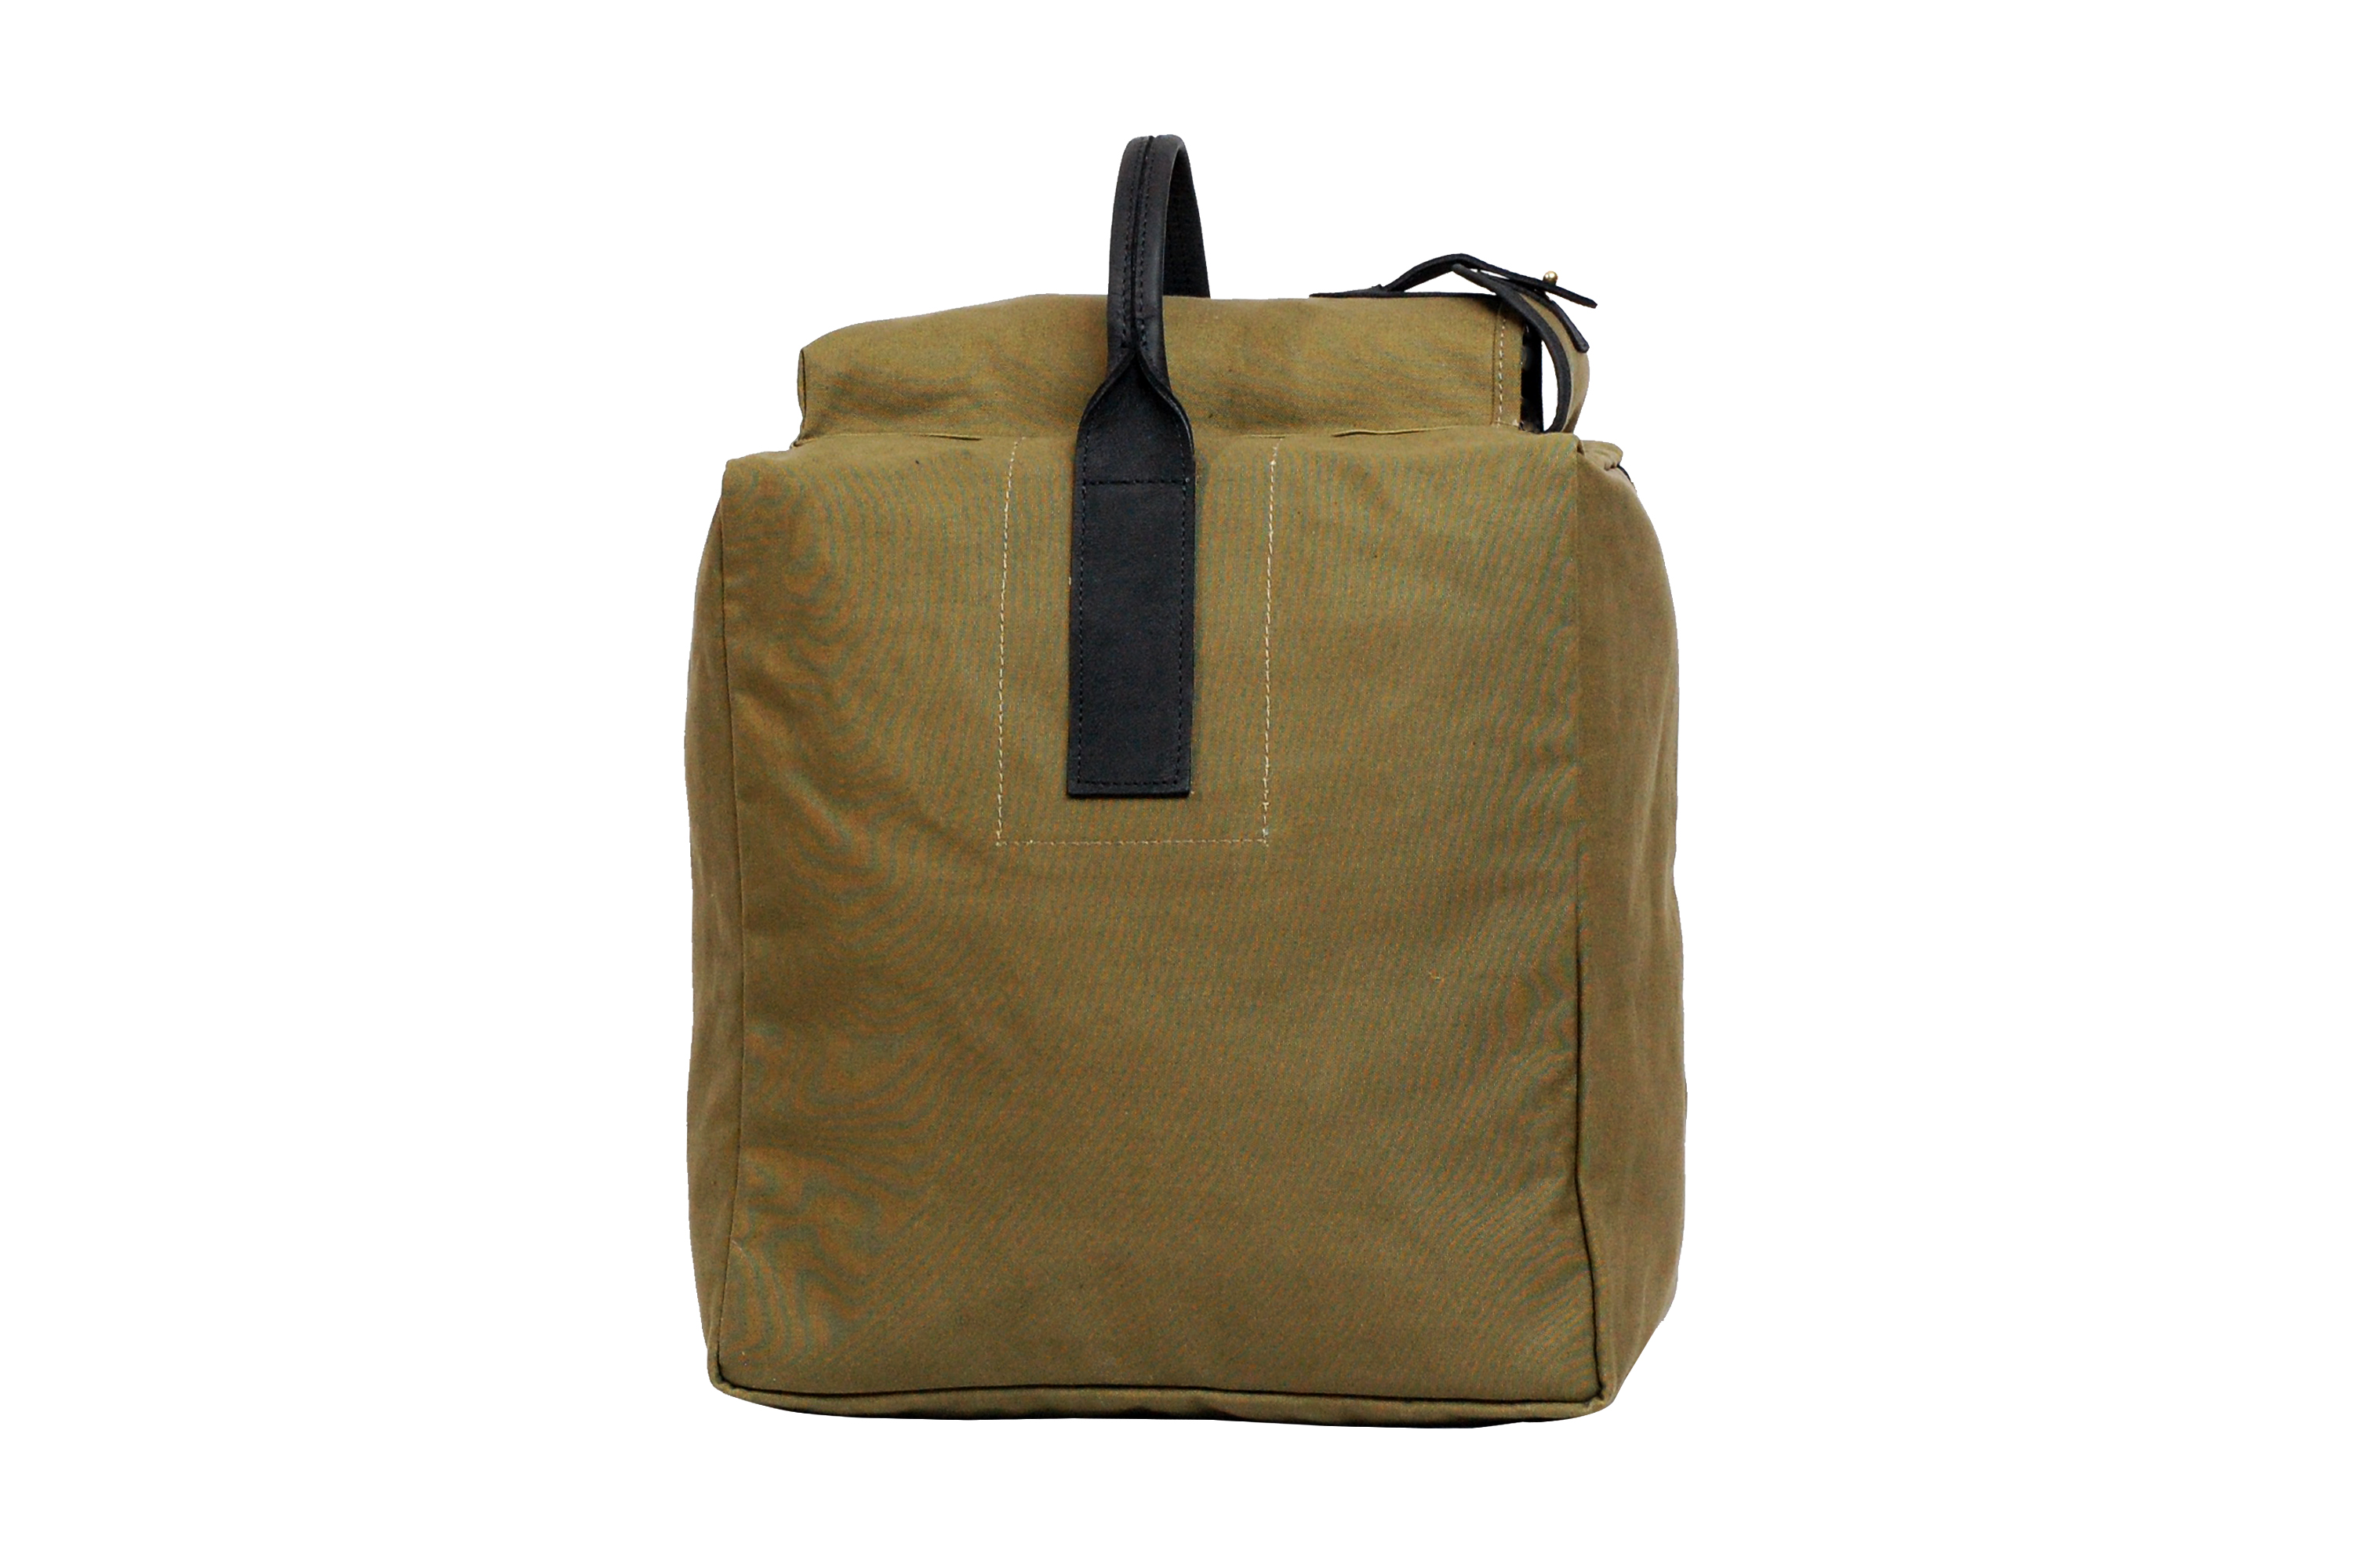 MAHIOUT ESCAPE BACKPACK LUXURY DESIGNER BAG